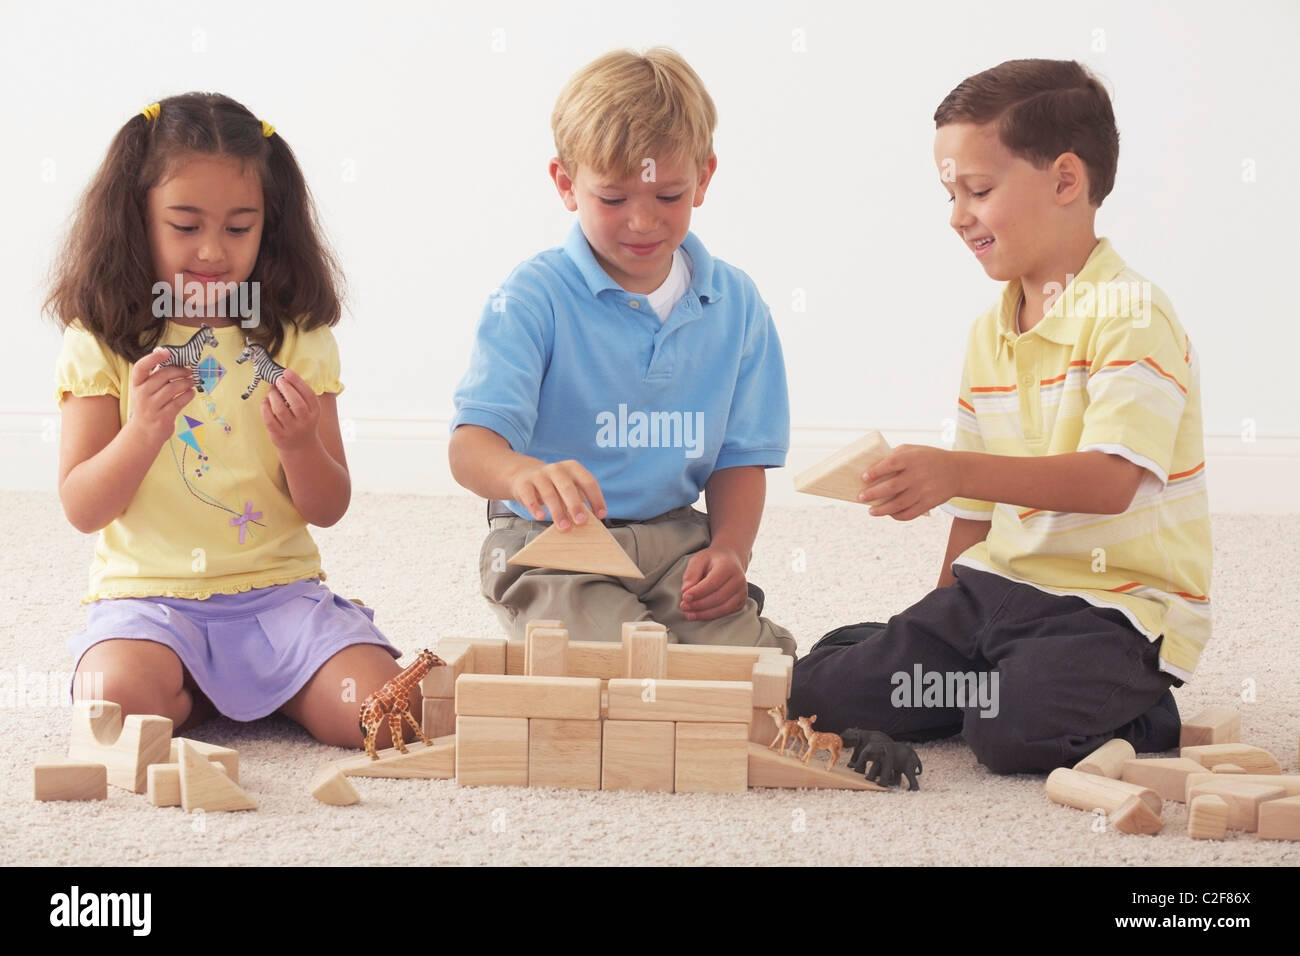 Three Children Building Noah's Ark With Wooden Blocks - Stock Image